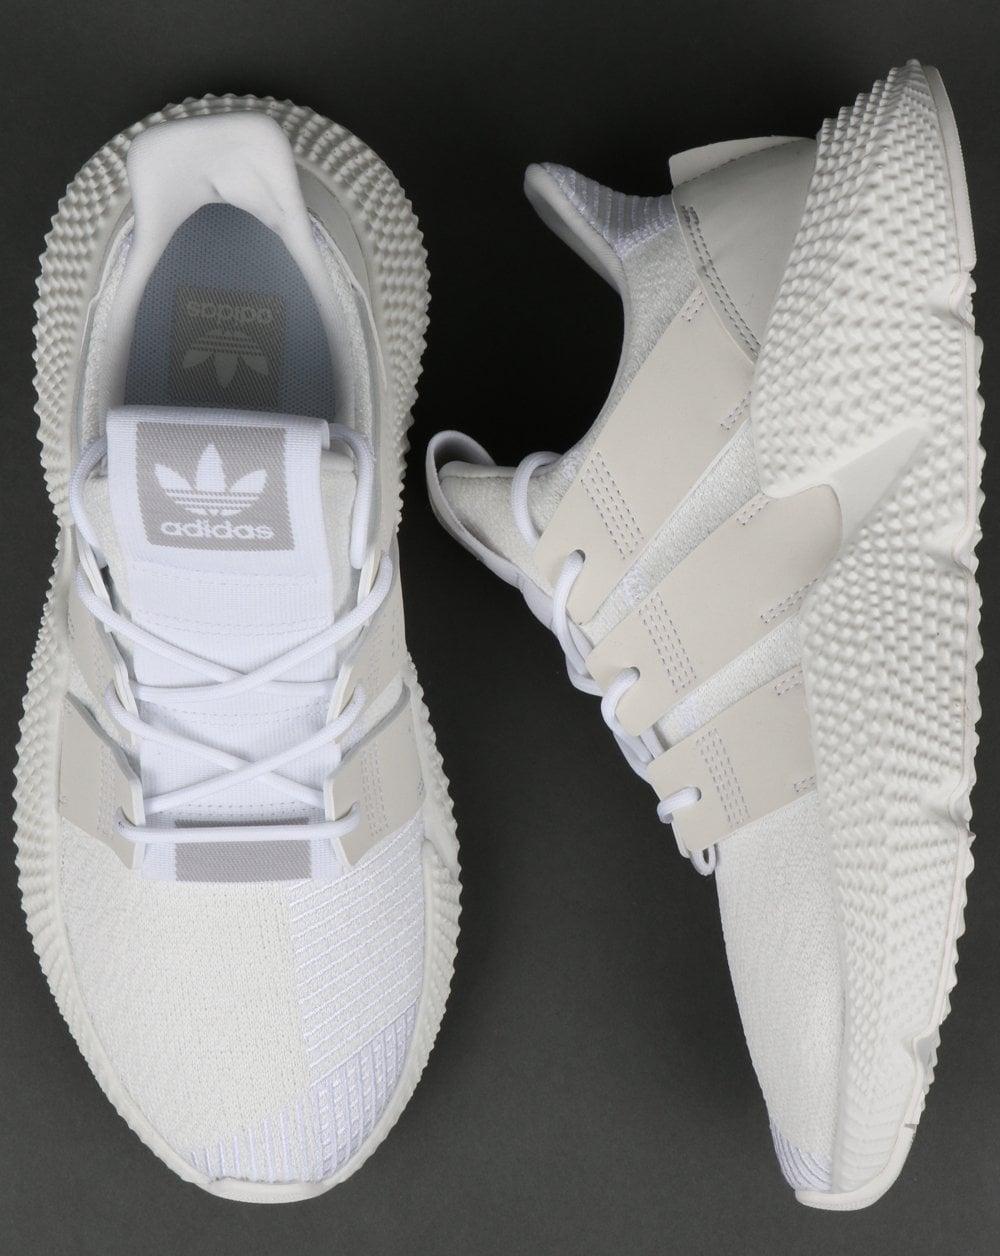 Adidas Prophere Trainers White Crystal White e28a4ebc5